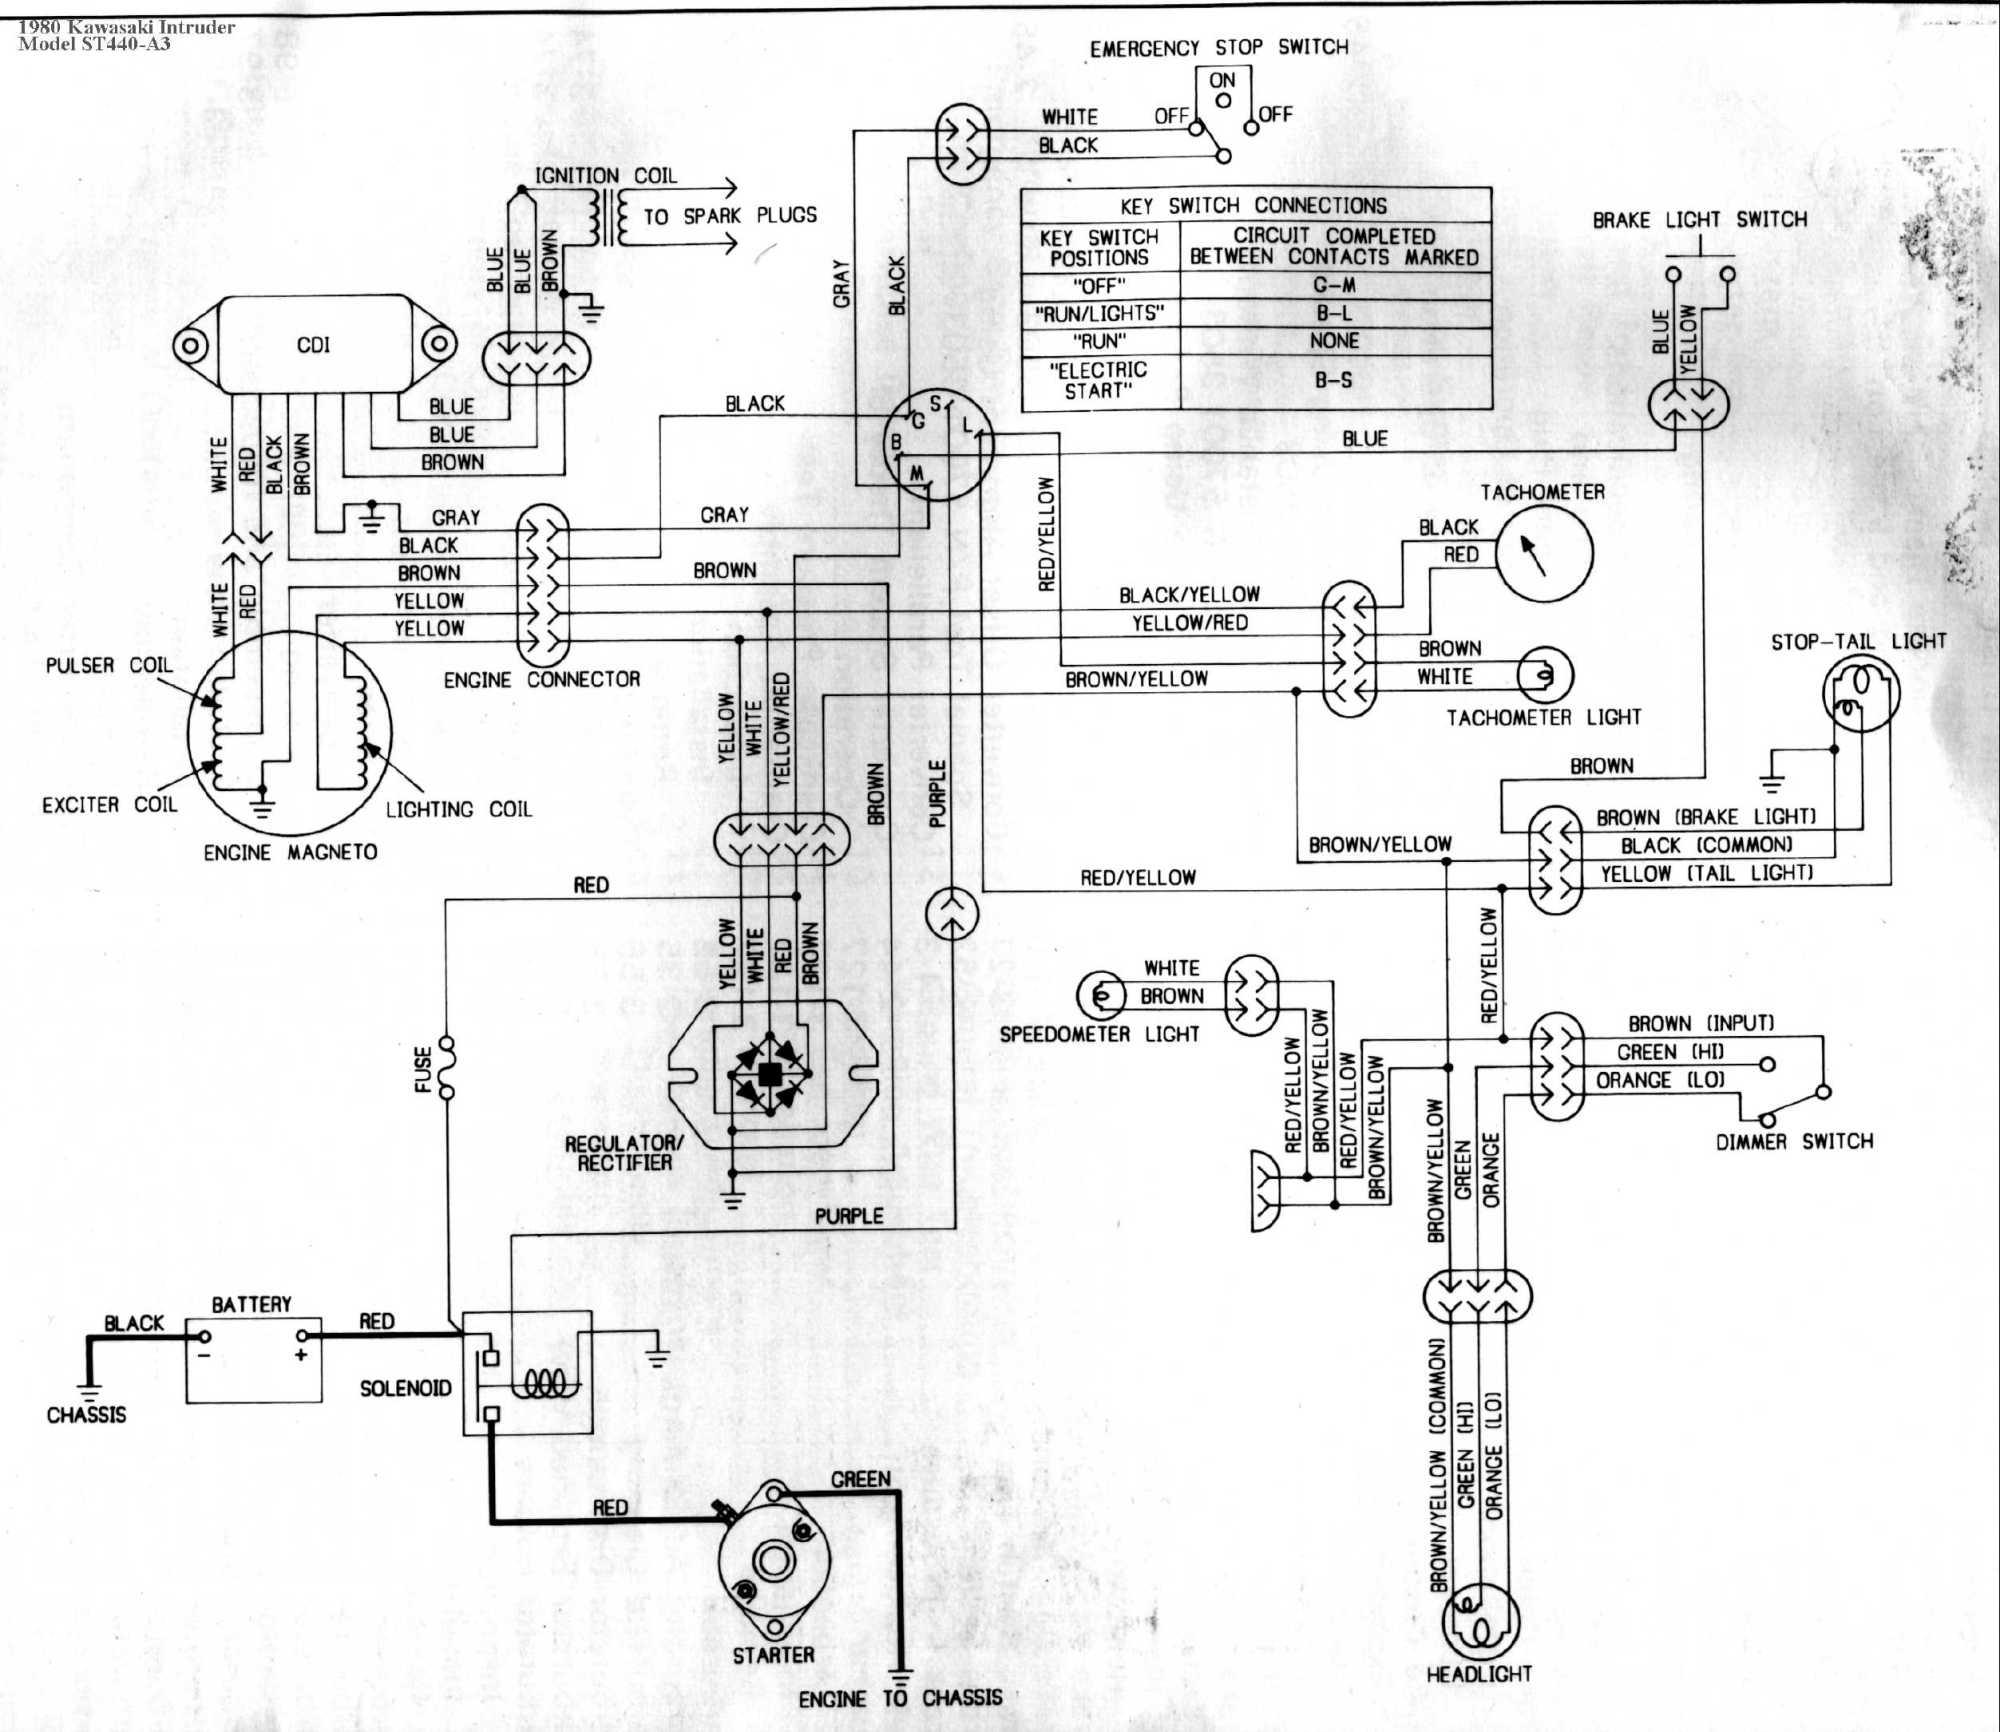 hight resolution of 1981 invader 1981 ltd electric start 1981 ltd manual start 1982 interceptor